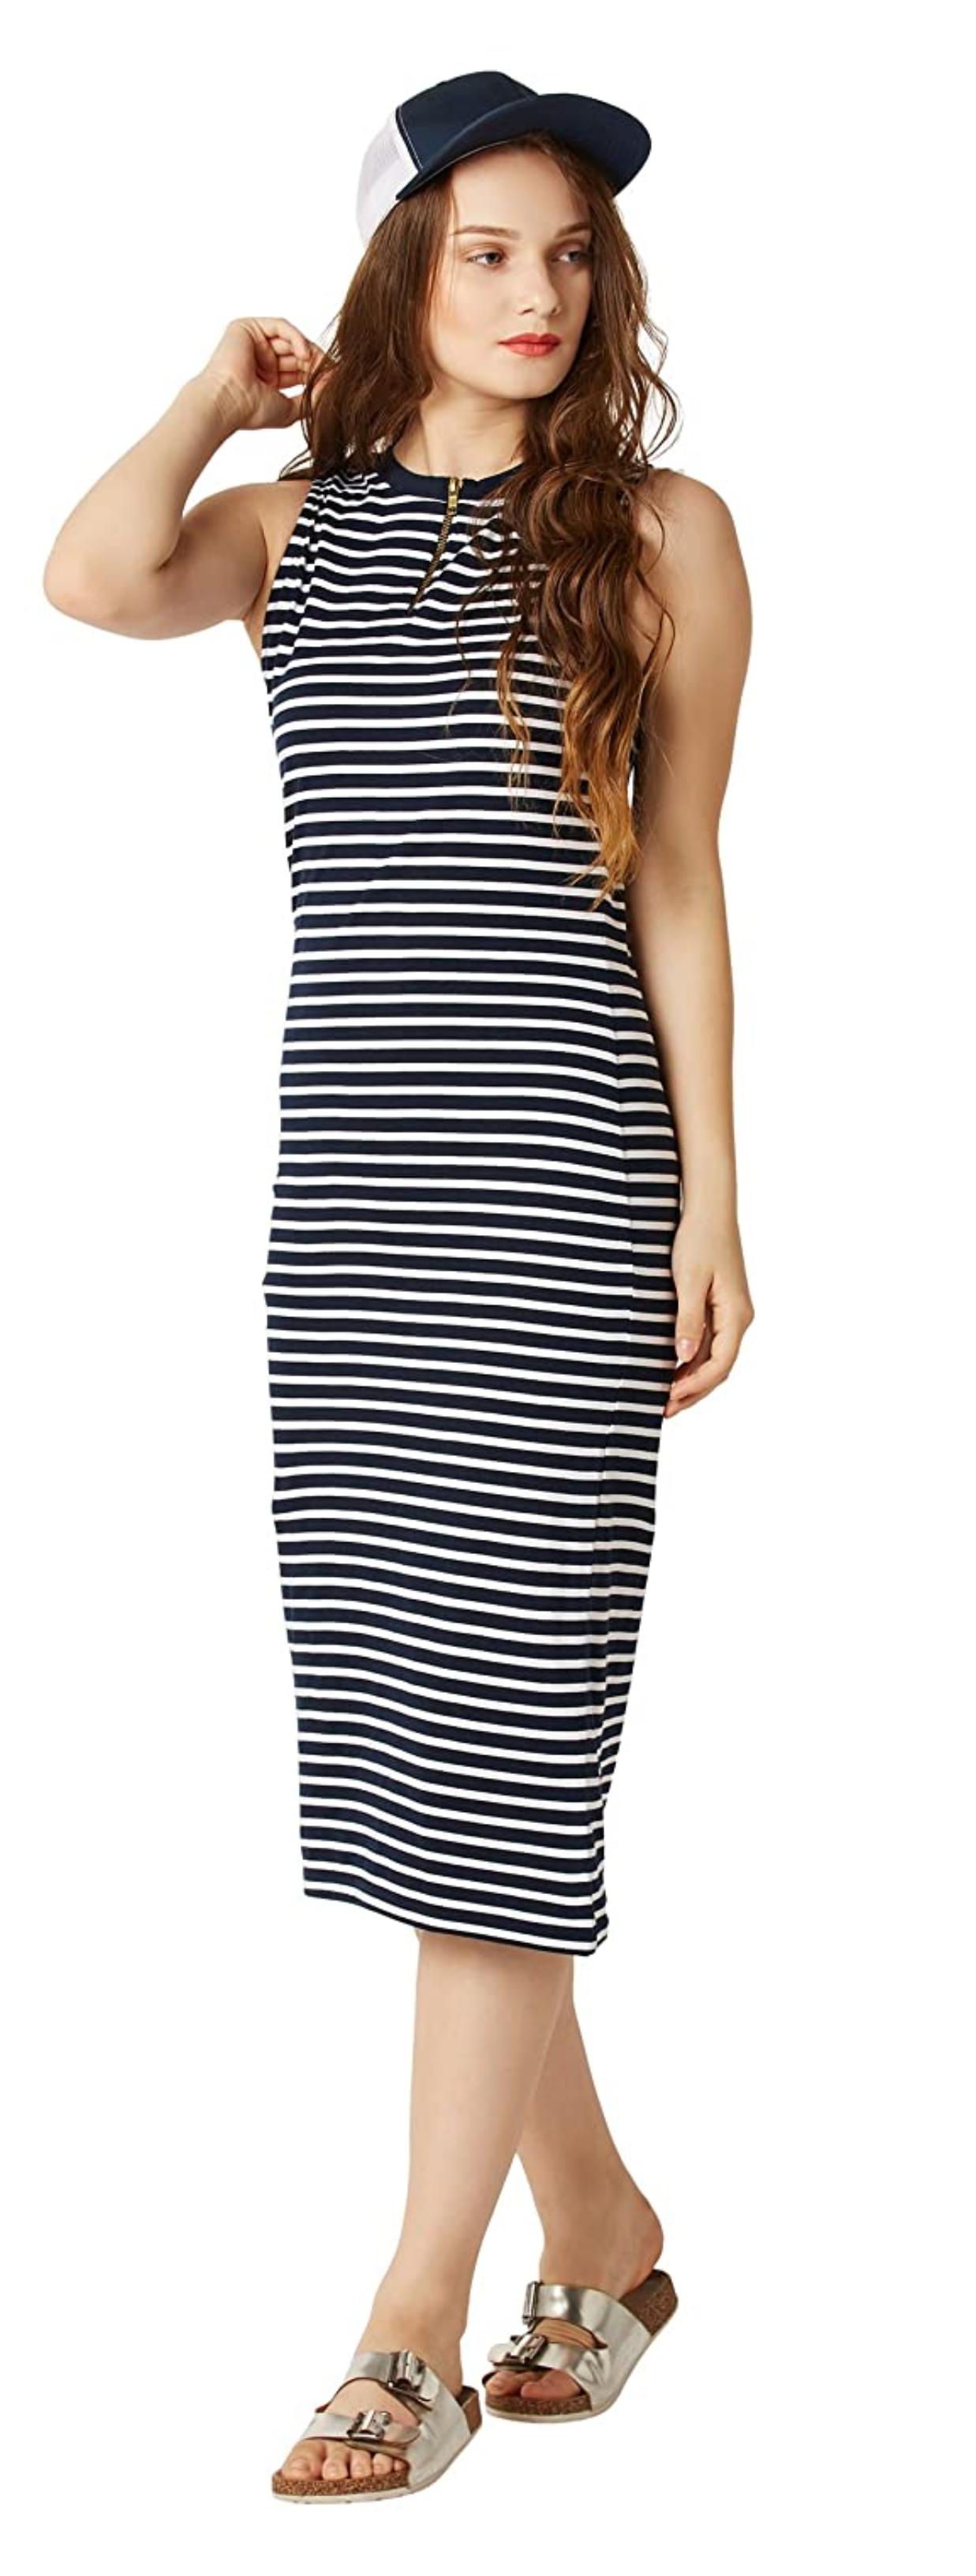 Miss Chase Women S Comfortable Cotton Striped Bodycon Midi Dress Striped Bodycon Midi Dress Bodycon Dress Dresses [ 3264 x 1237 Pixel ]